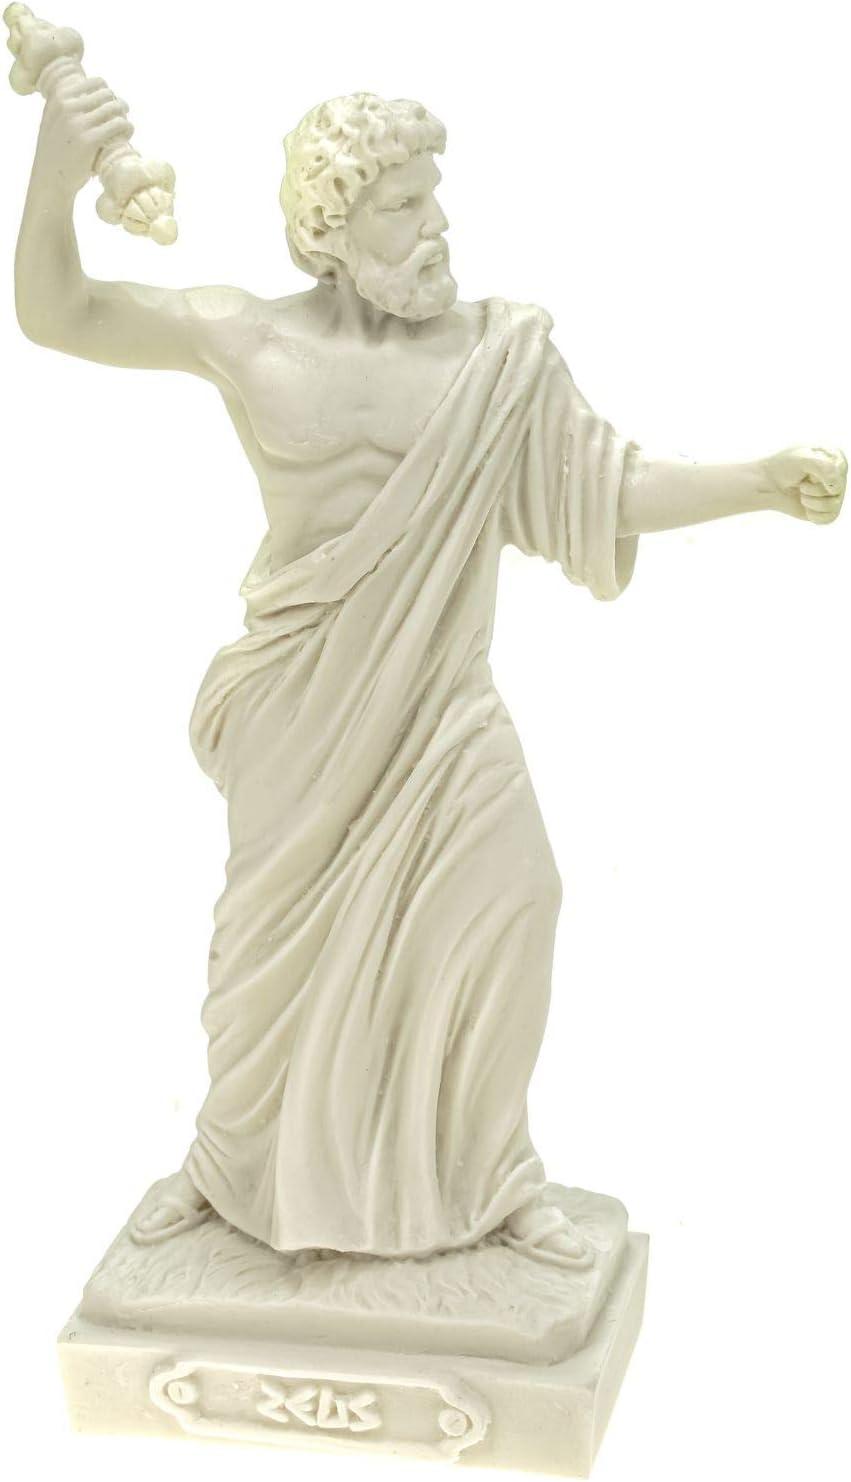 Alabaster Deko Figur Zeus nordischer G/öttervater 16 cm Skulptur wei/ß